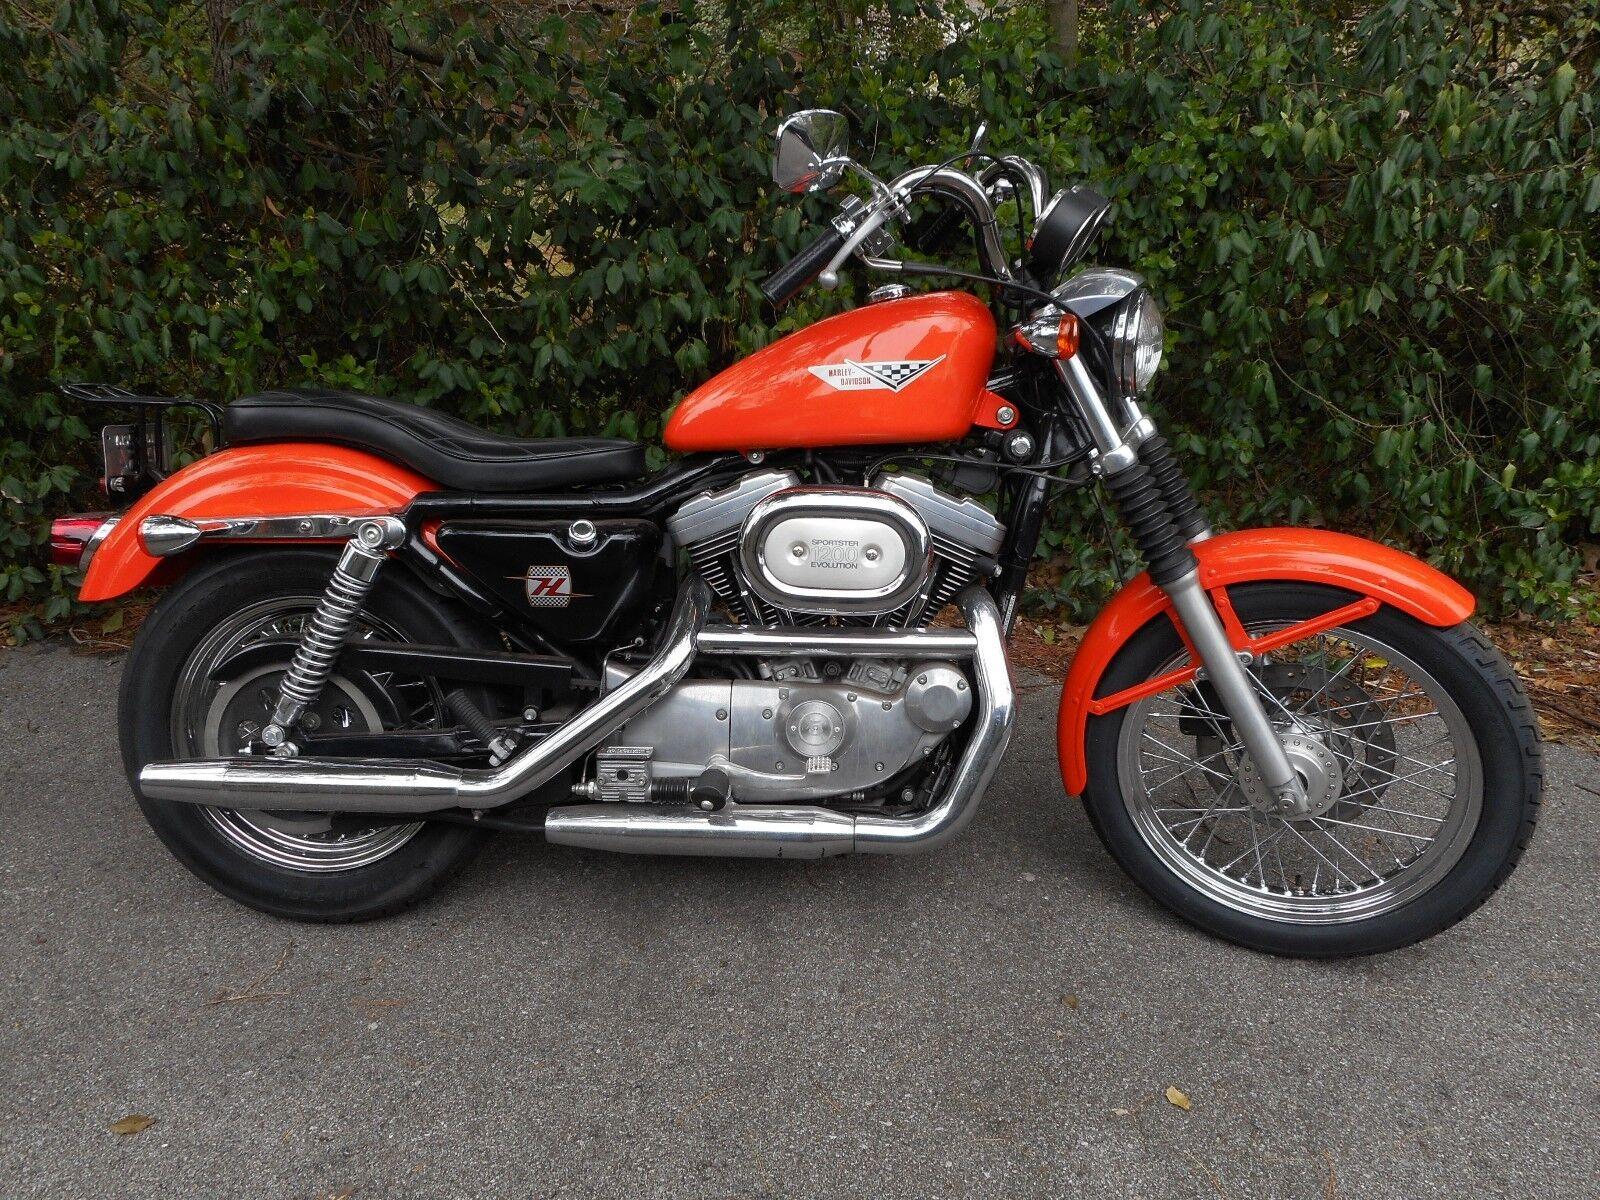 2002 Harley Davidson Sportster 1200 - Used Harley-davidson ...